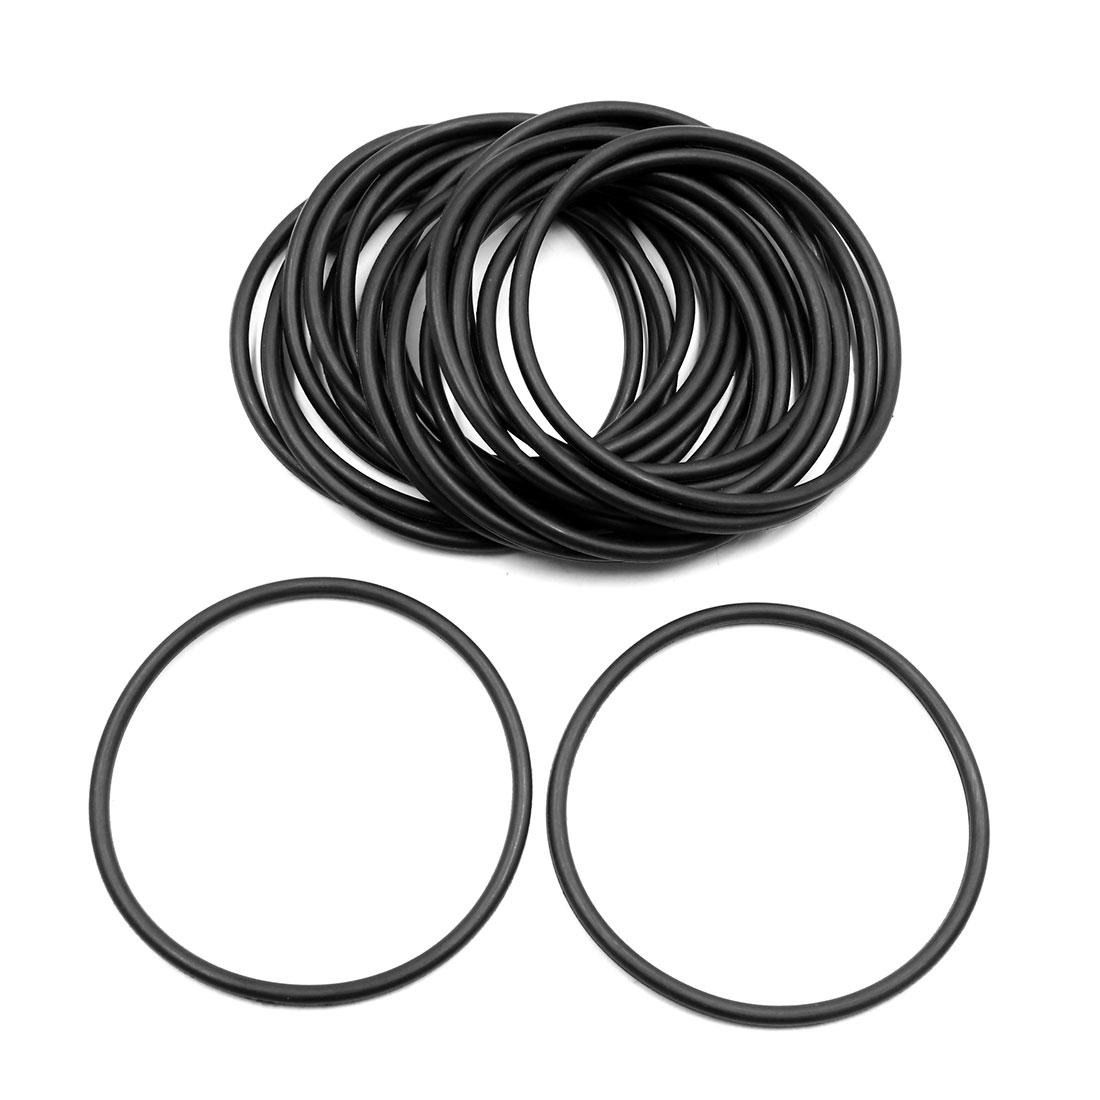 20pcs Black Universal Nitrile Rubber O-Ring Seals Gasket for Car 69 x 3.55mm